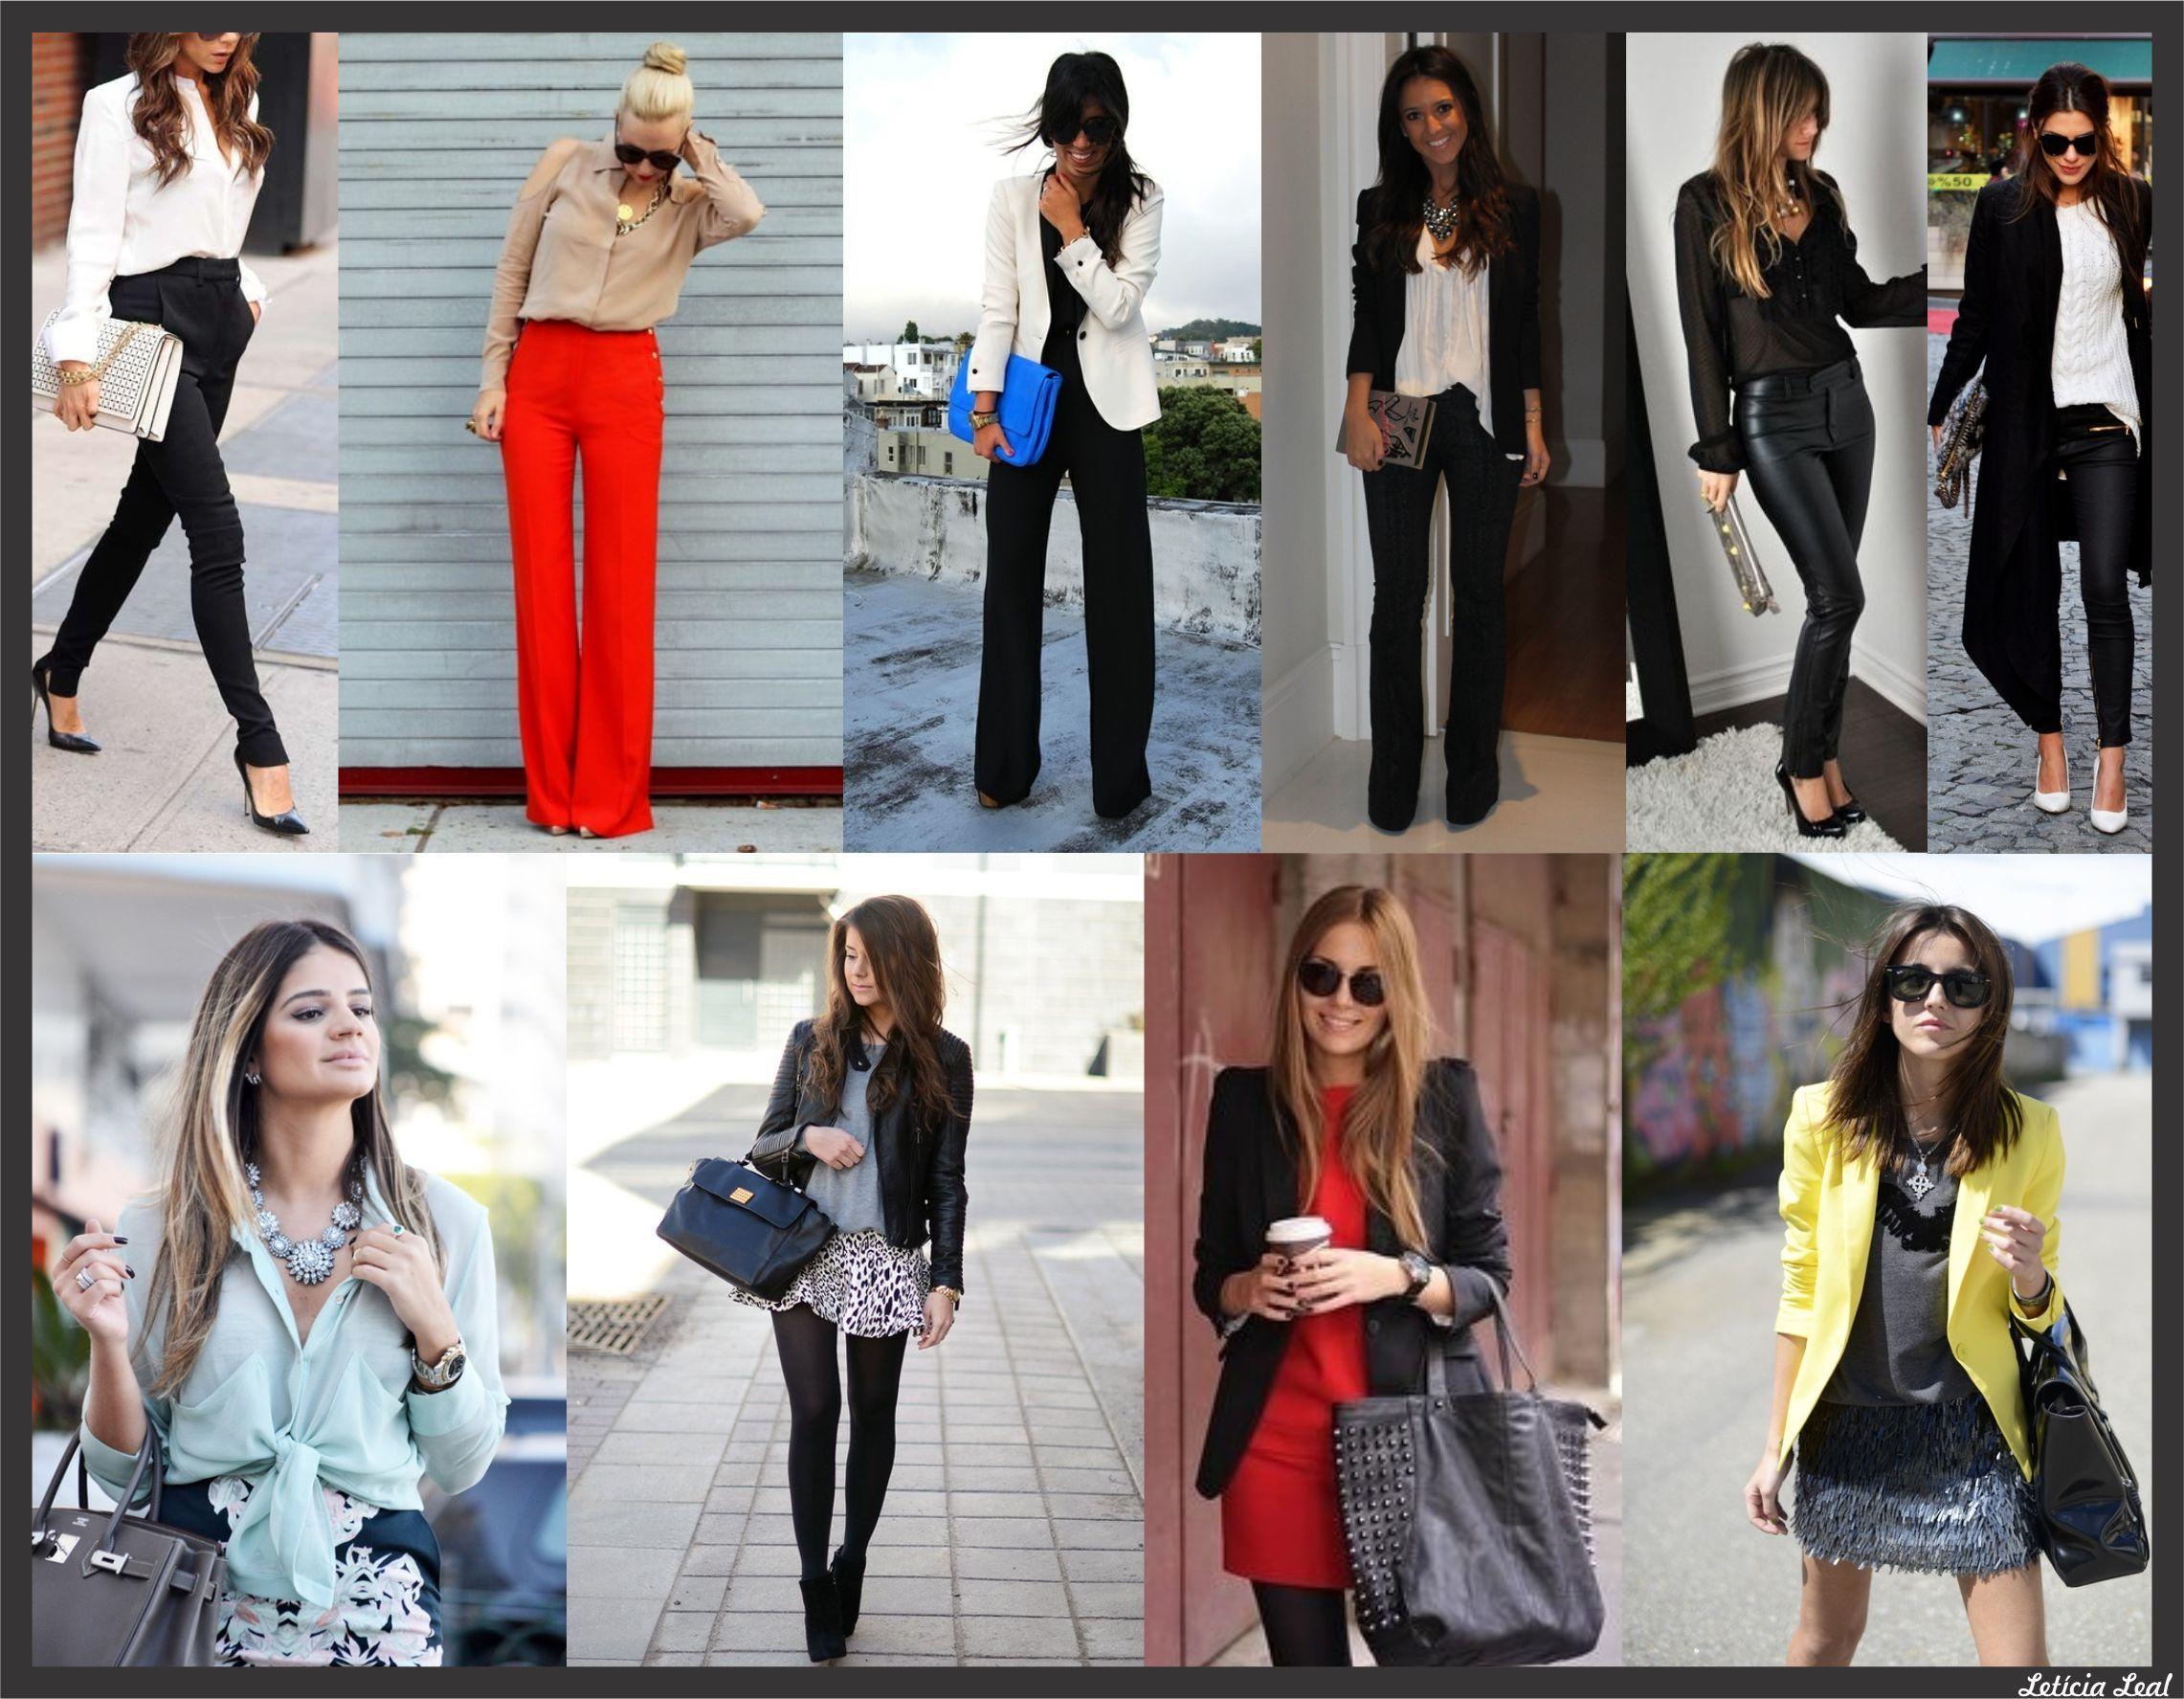 estilo_elegante_sos_solteiros